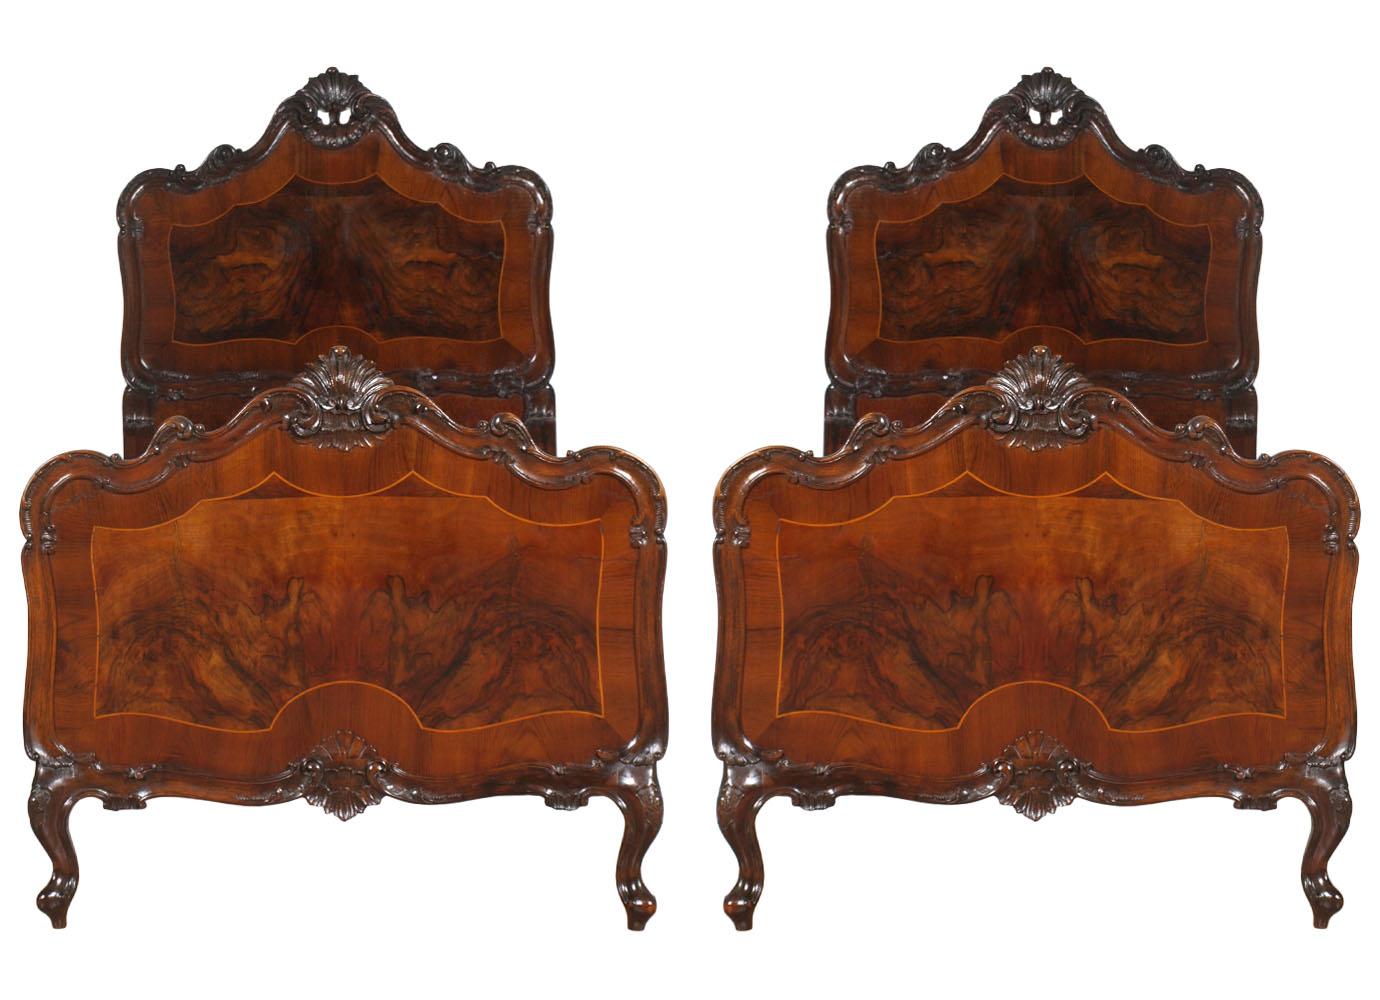 Baroque bedroom furniture antica camera da letto barocco - Camera da letto barocco veneziano usato ...